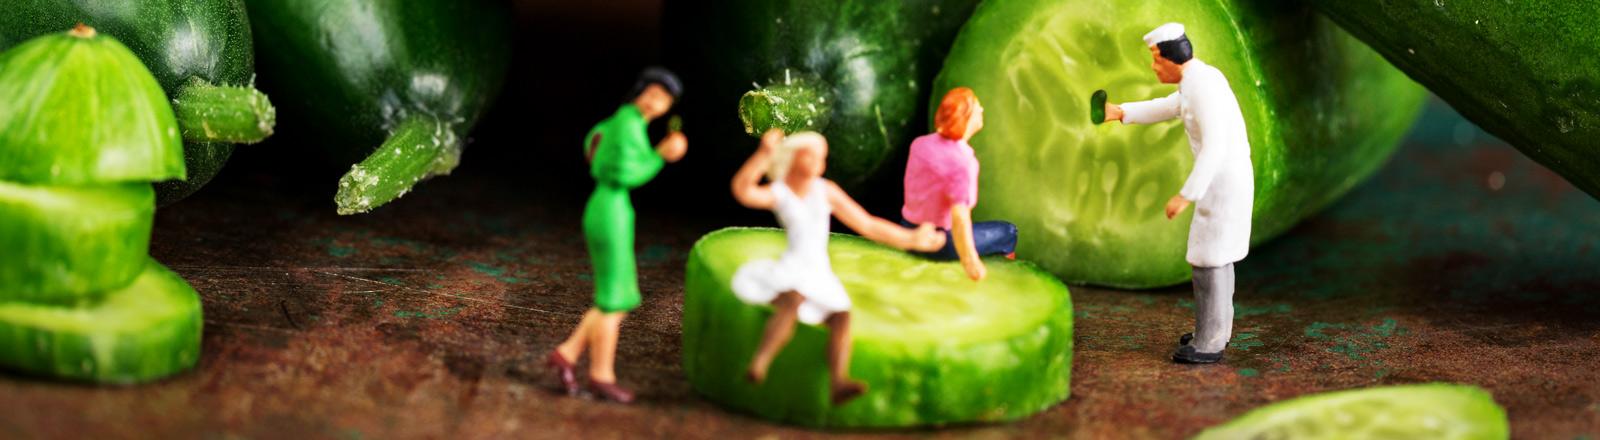 Gurken mit Miniaturfiguren